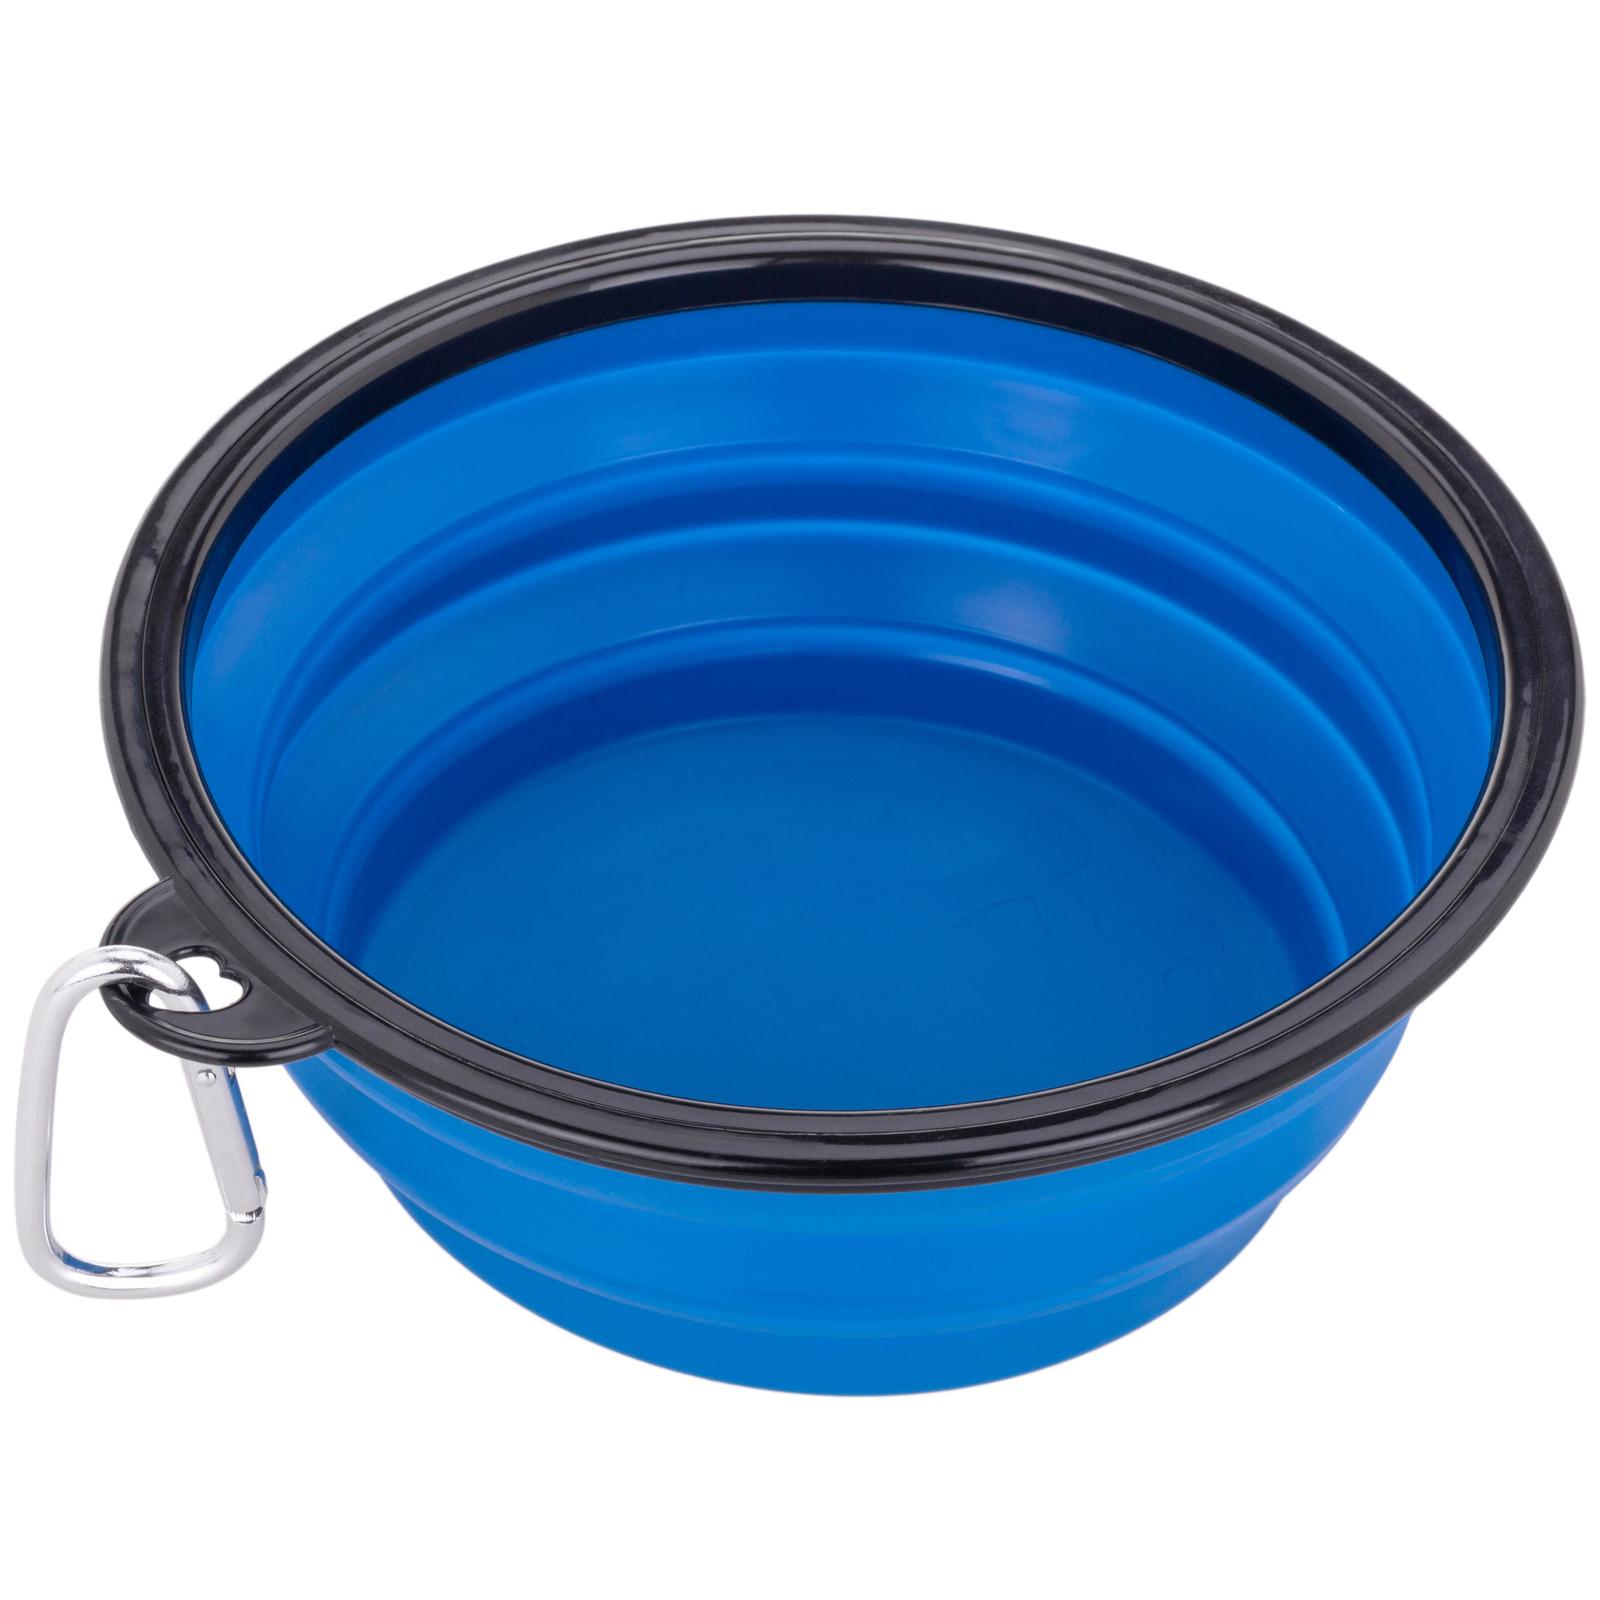 Comedero plegable de goma para mascotas 1000 ml azul